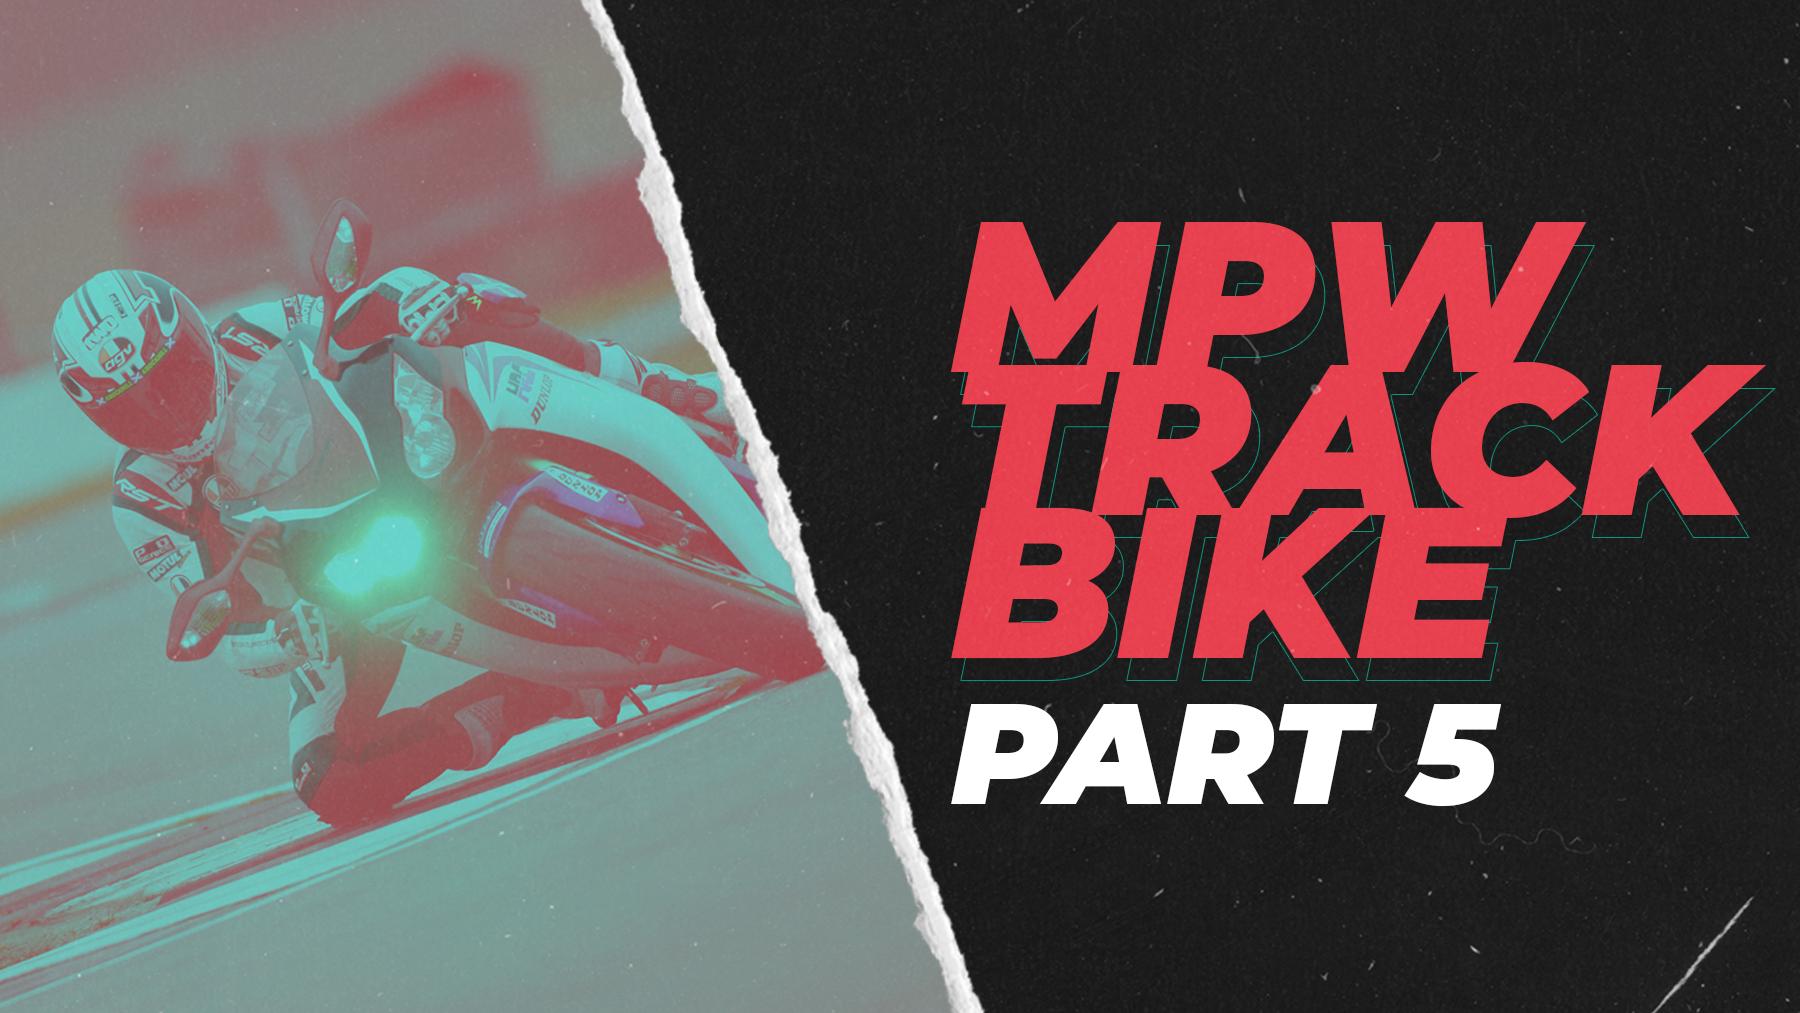 MPW Track Bike: Part 5